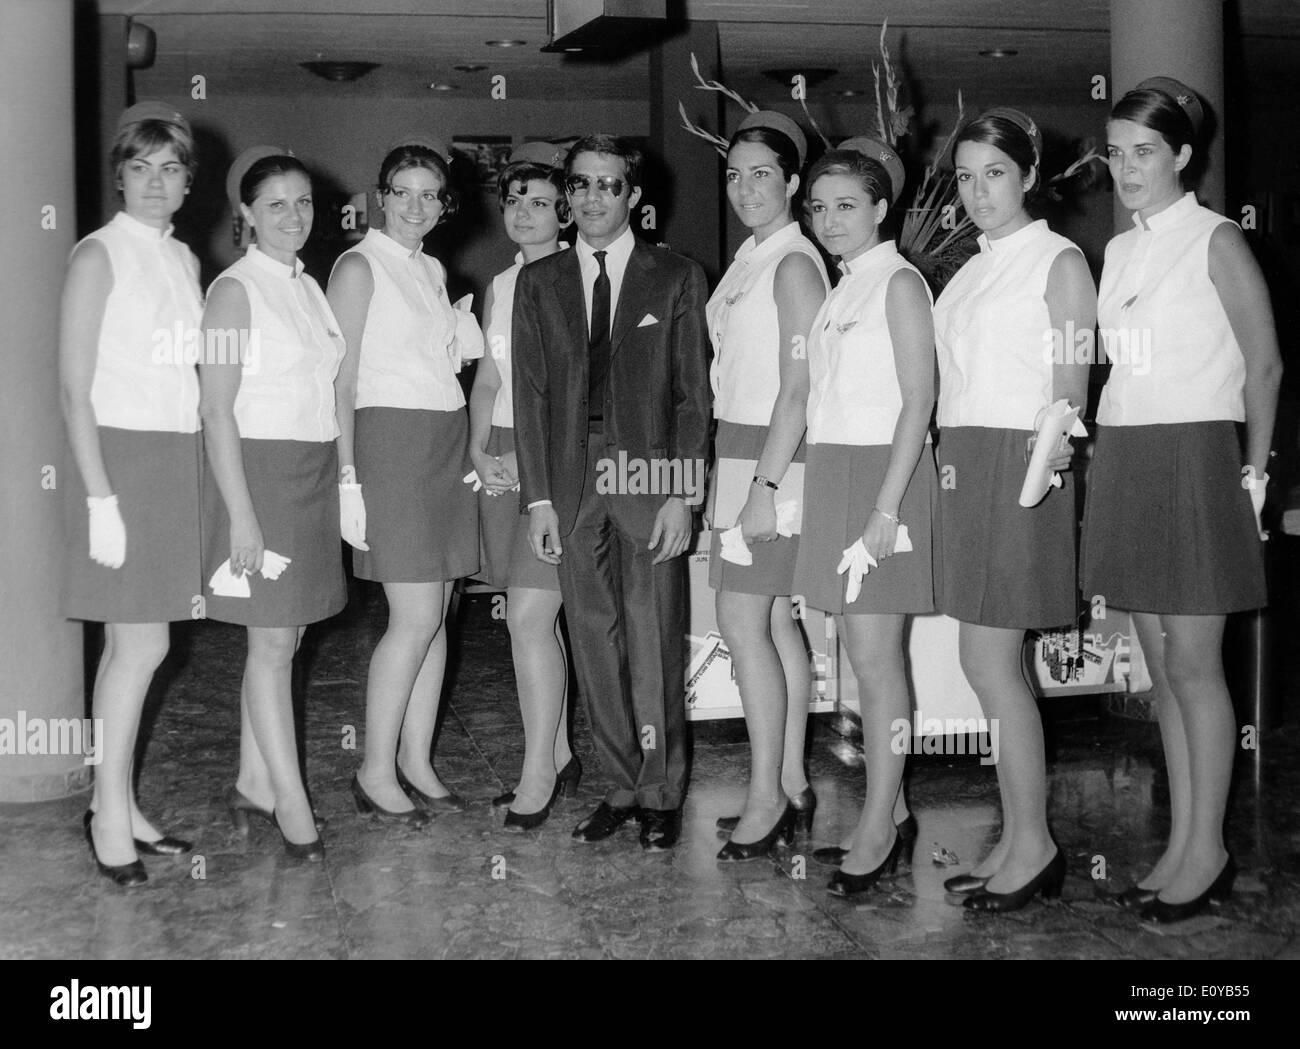 Alexander Onassis with Olympic Airways flight attendants - Stock Image